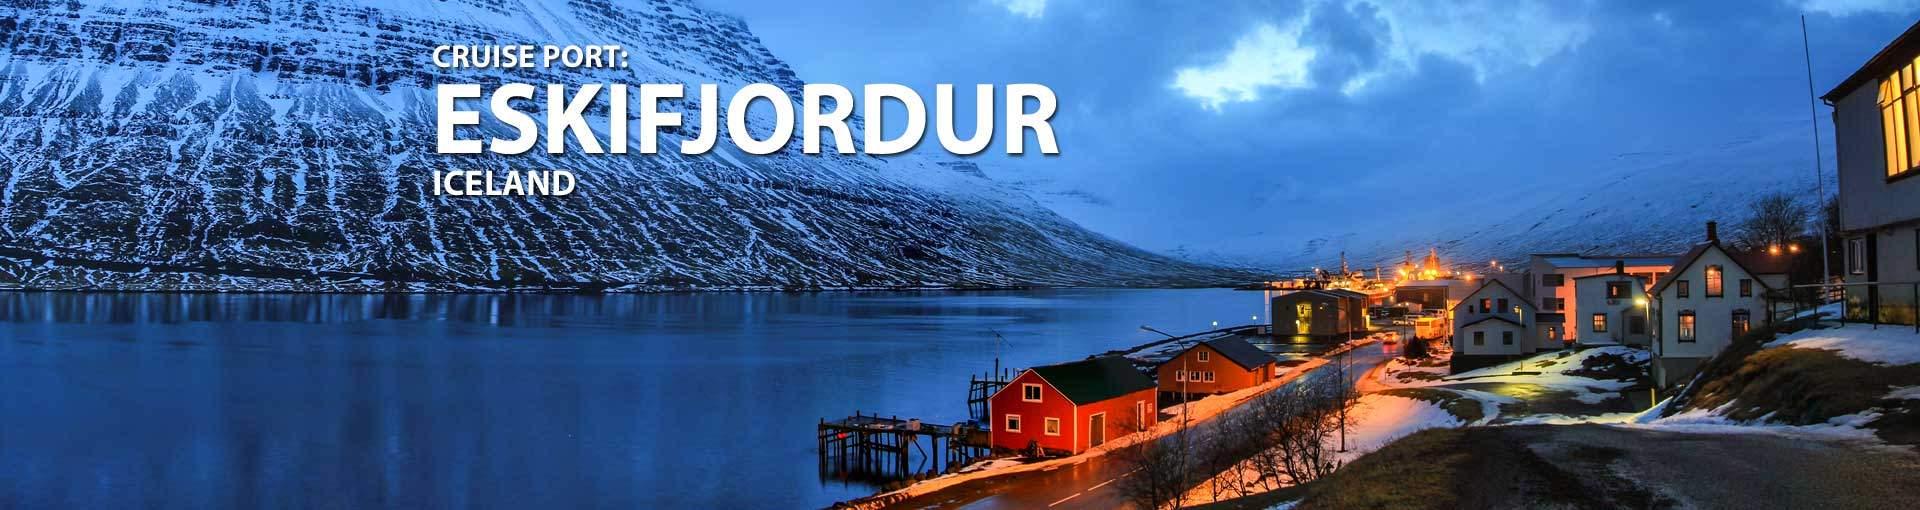 Cruises to Eskifjordur, Iceland